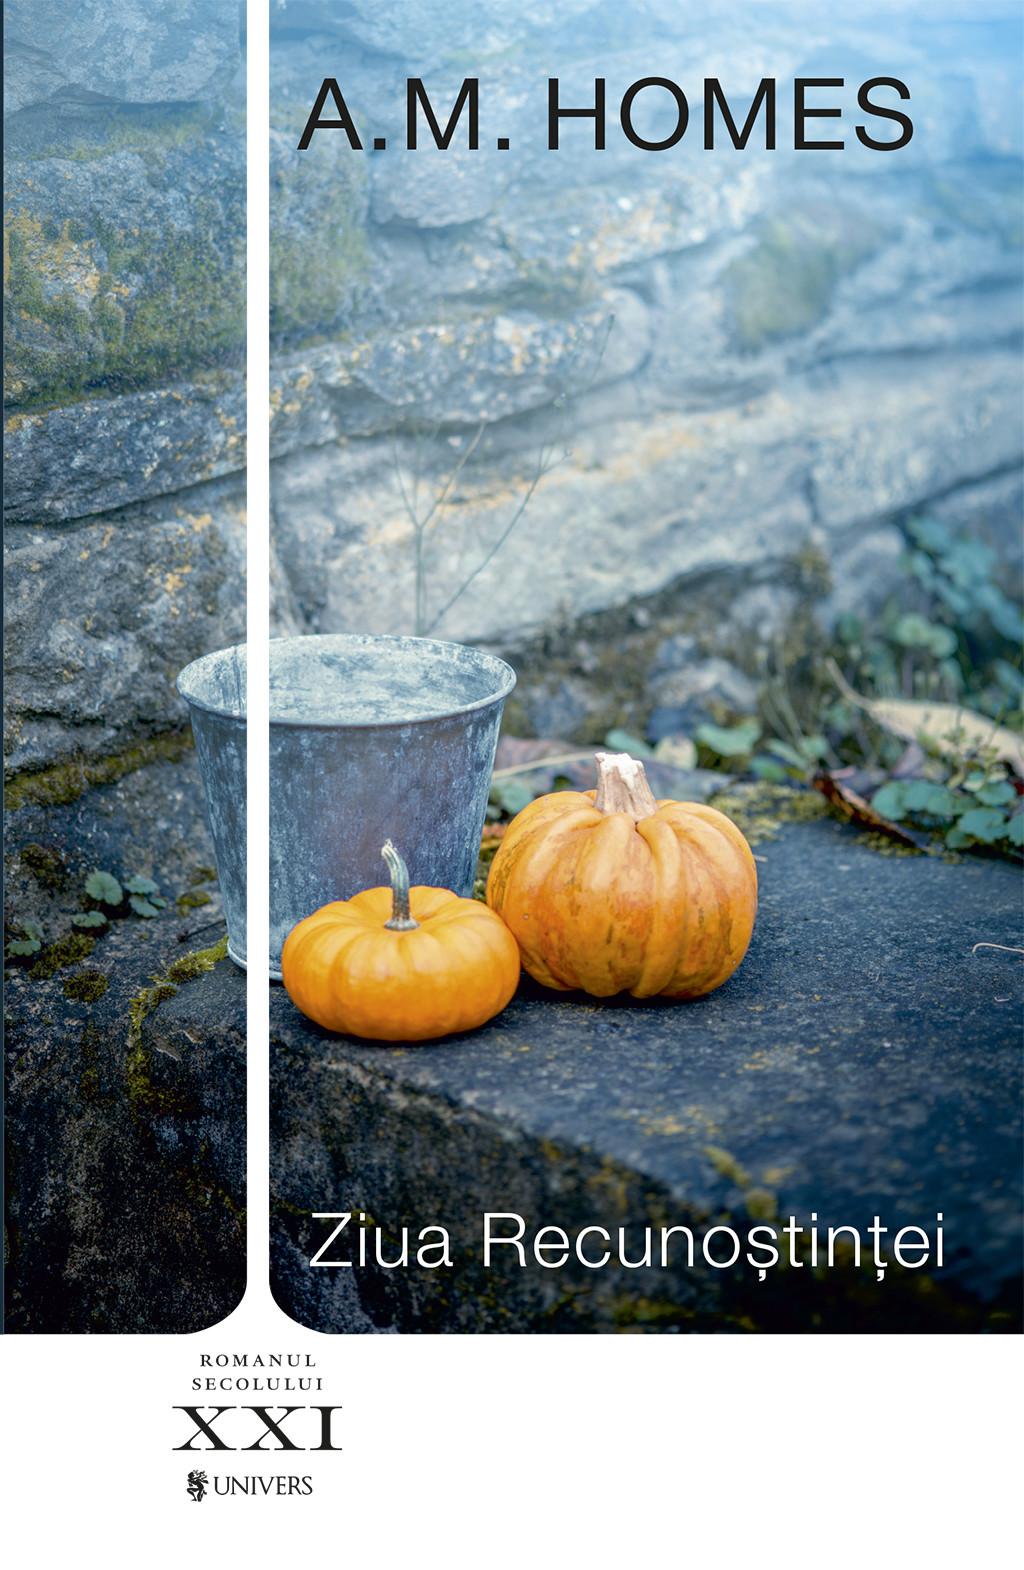 PDF ePUB Ziua recunostintei de A.M. Homes (Download eBook)